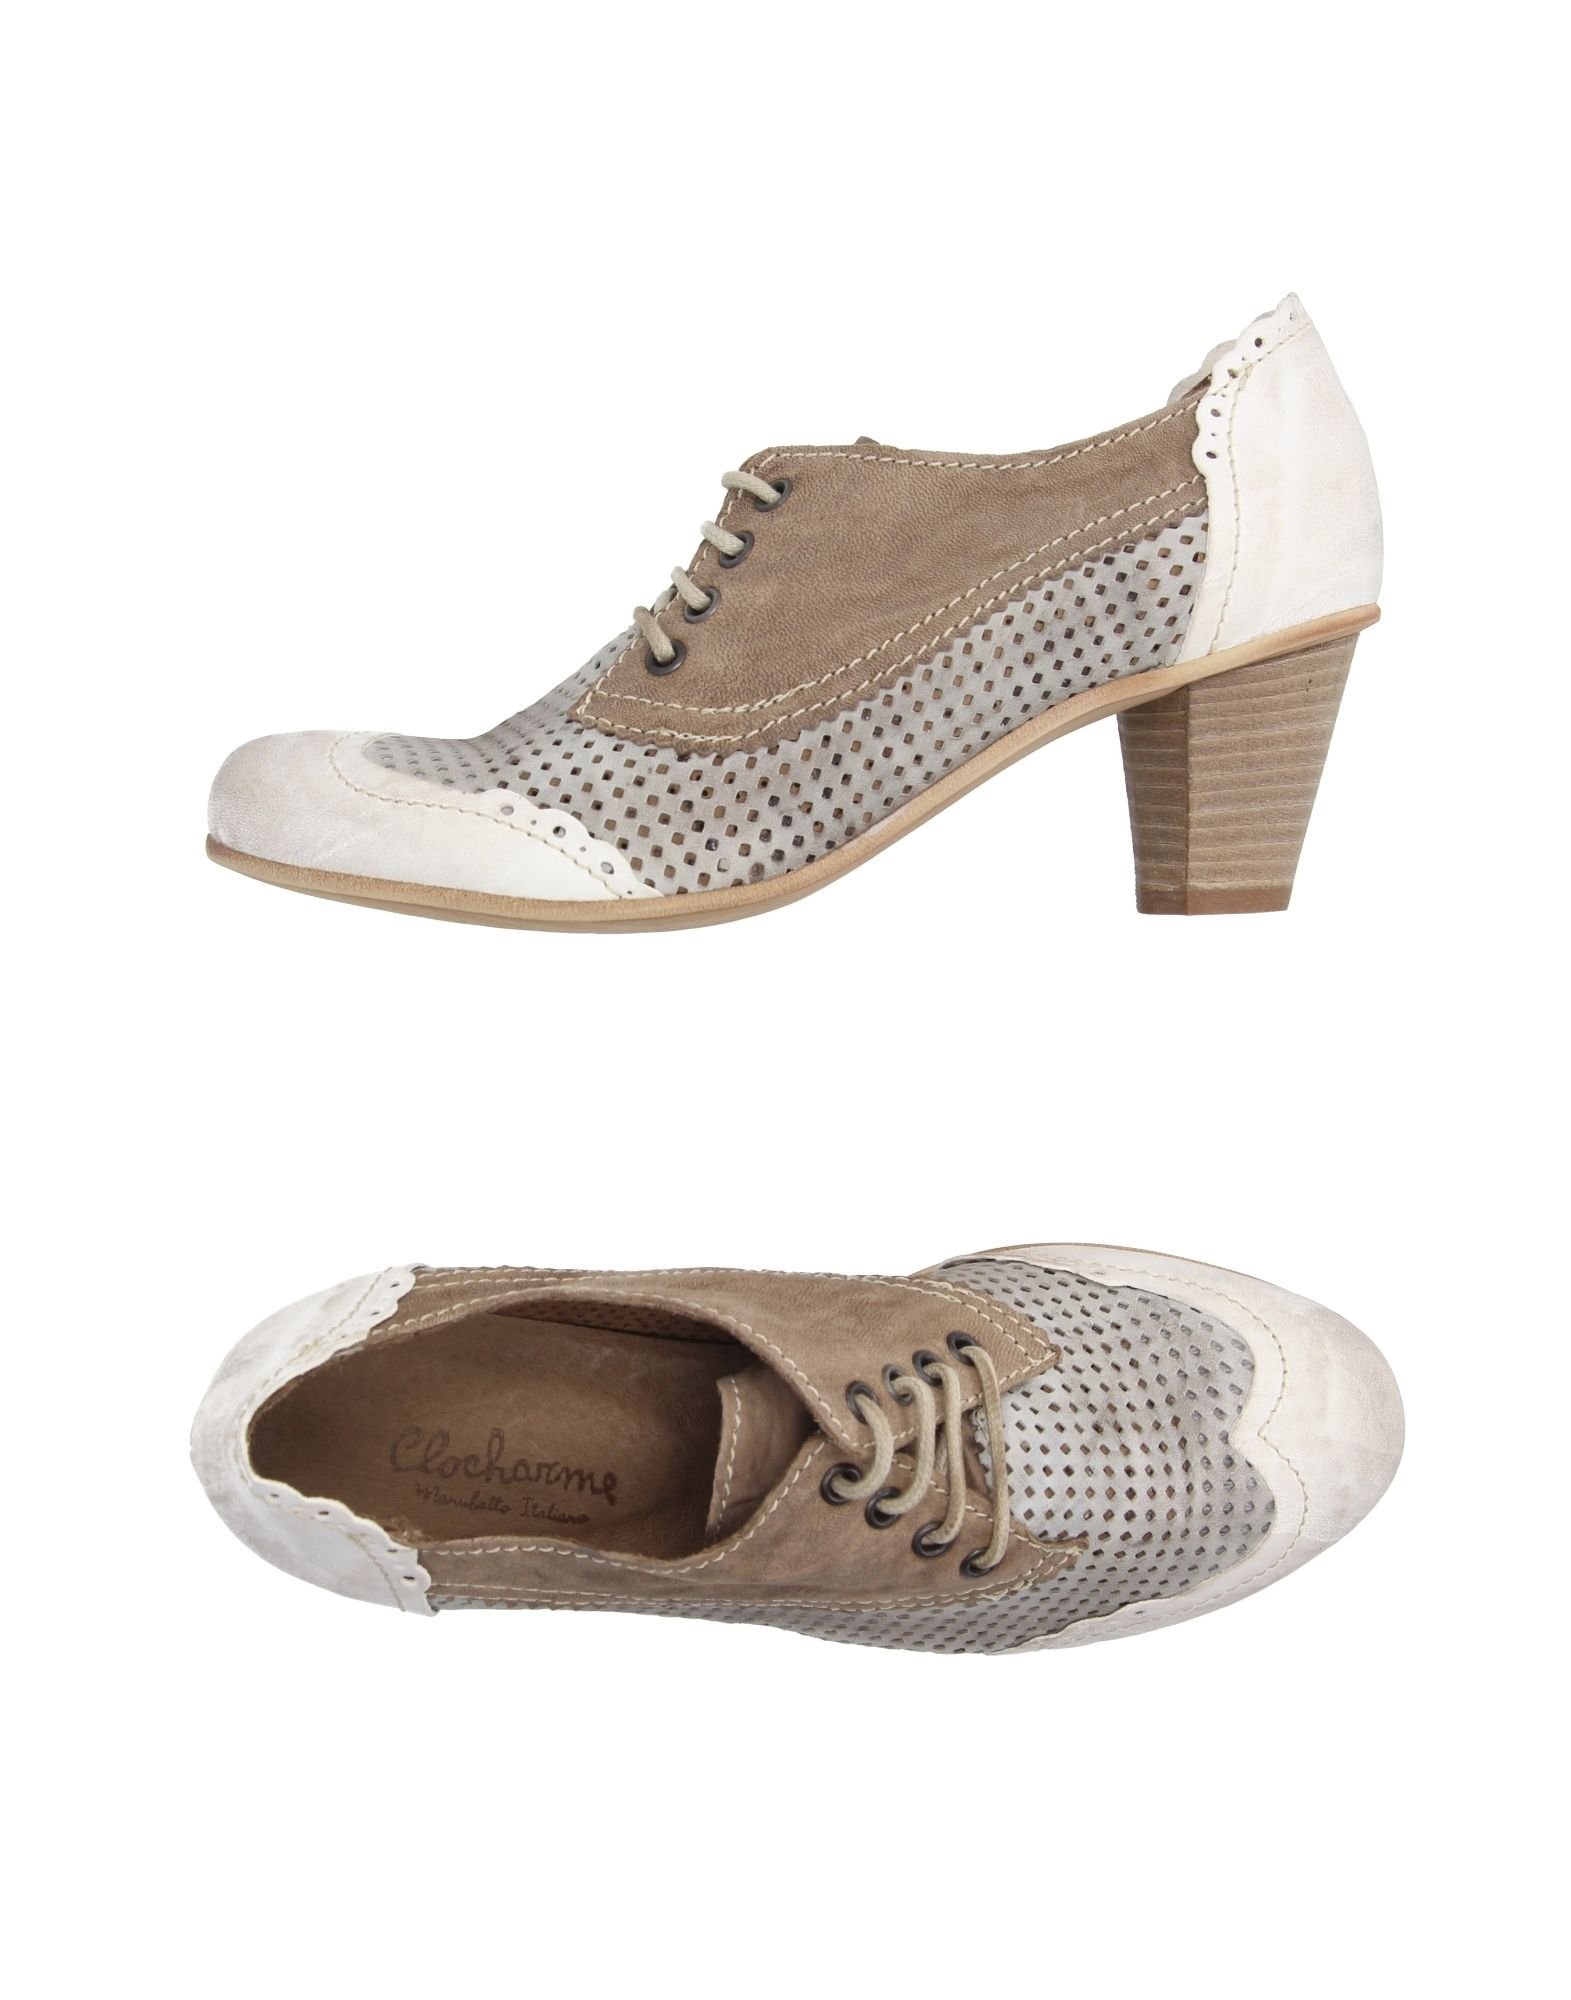 Clocharme Schnürschuhe Damen  44955640NJ Gute Qualität beliebte Schuhe